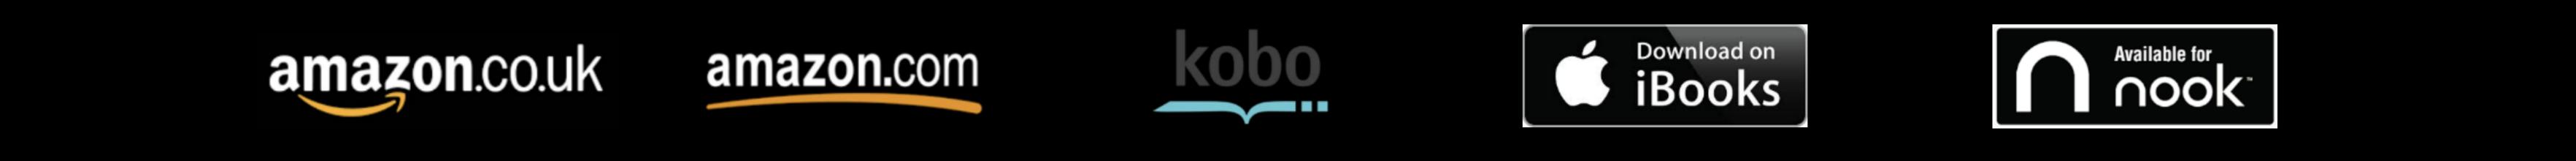 kobo amazon logo image